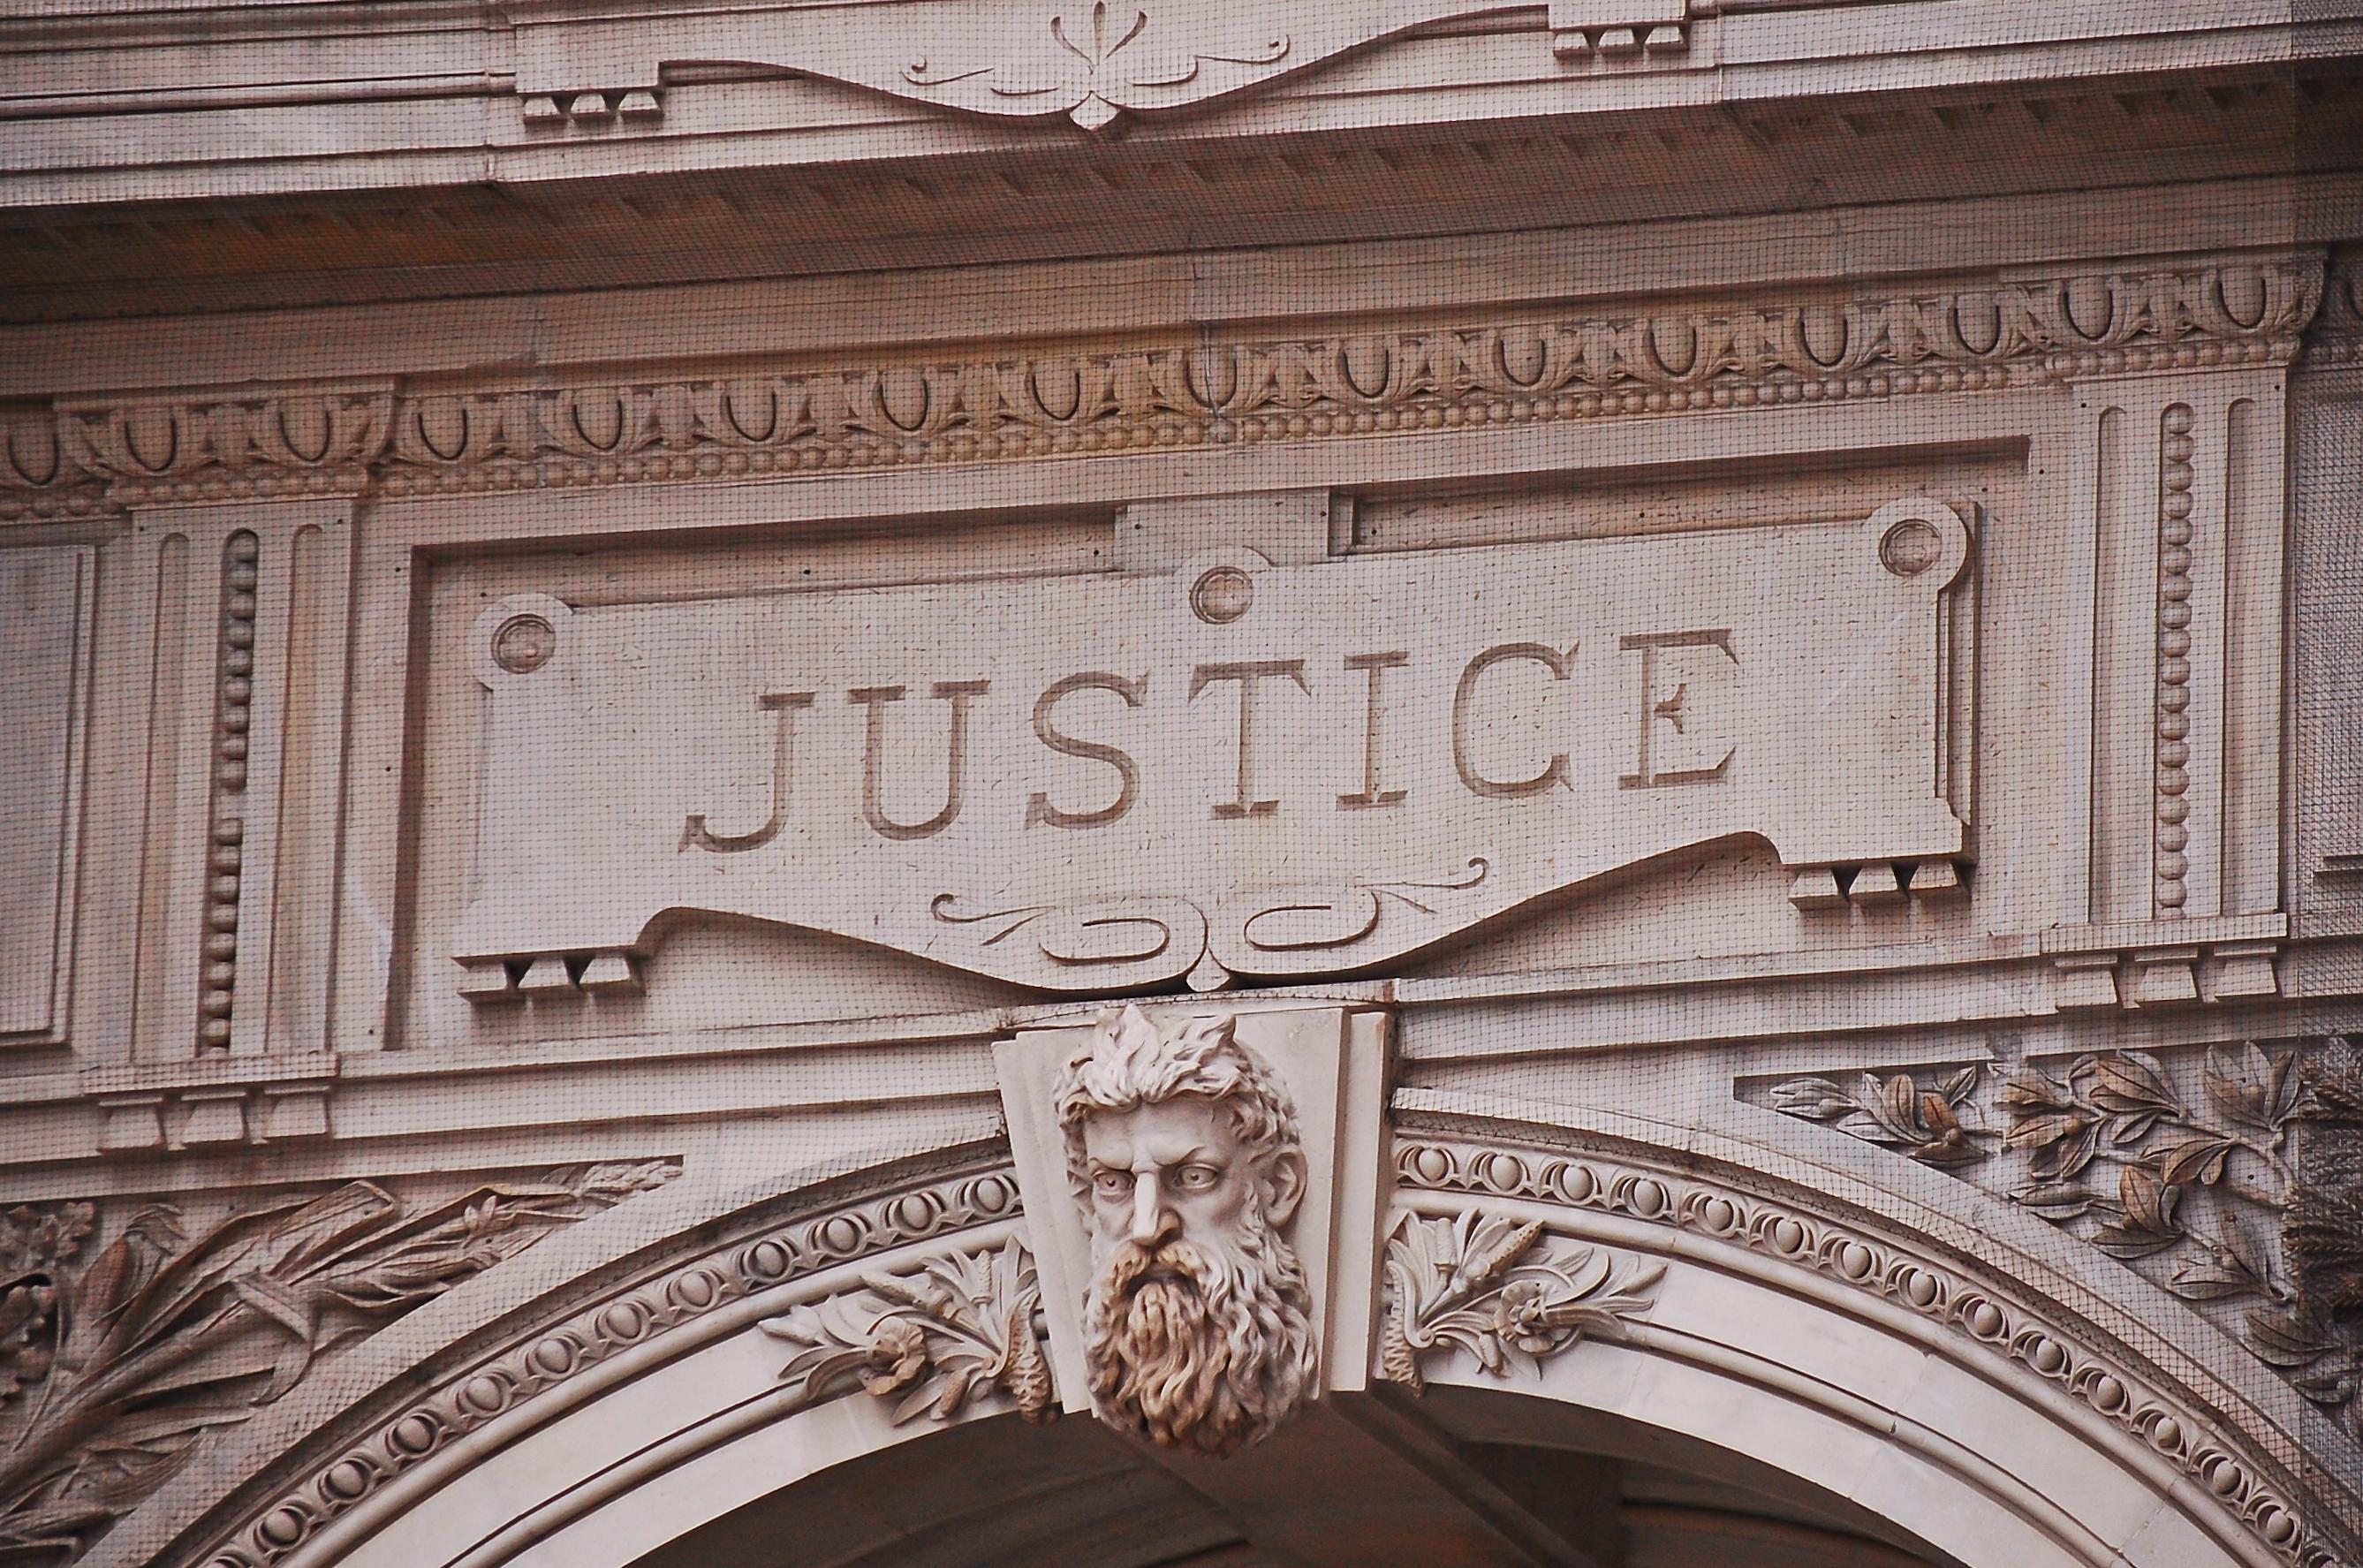 Justice sigh, Philadelphia City Hall, Pennsylvania.(Shutterstock/DimitryBR)